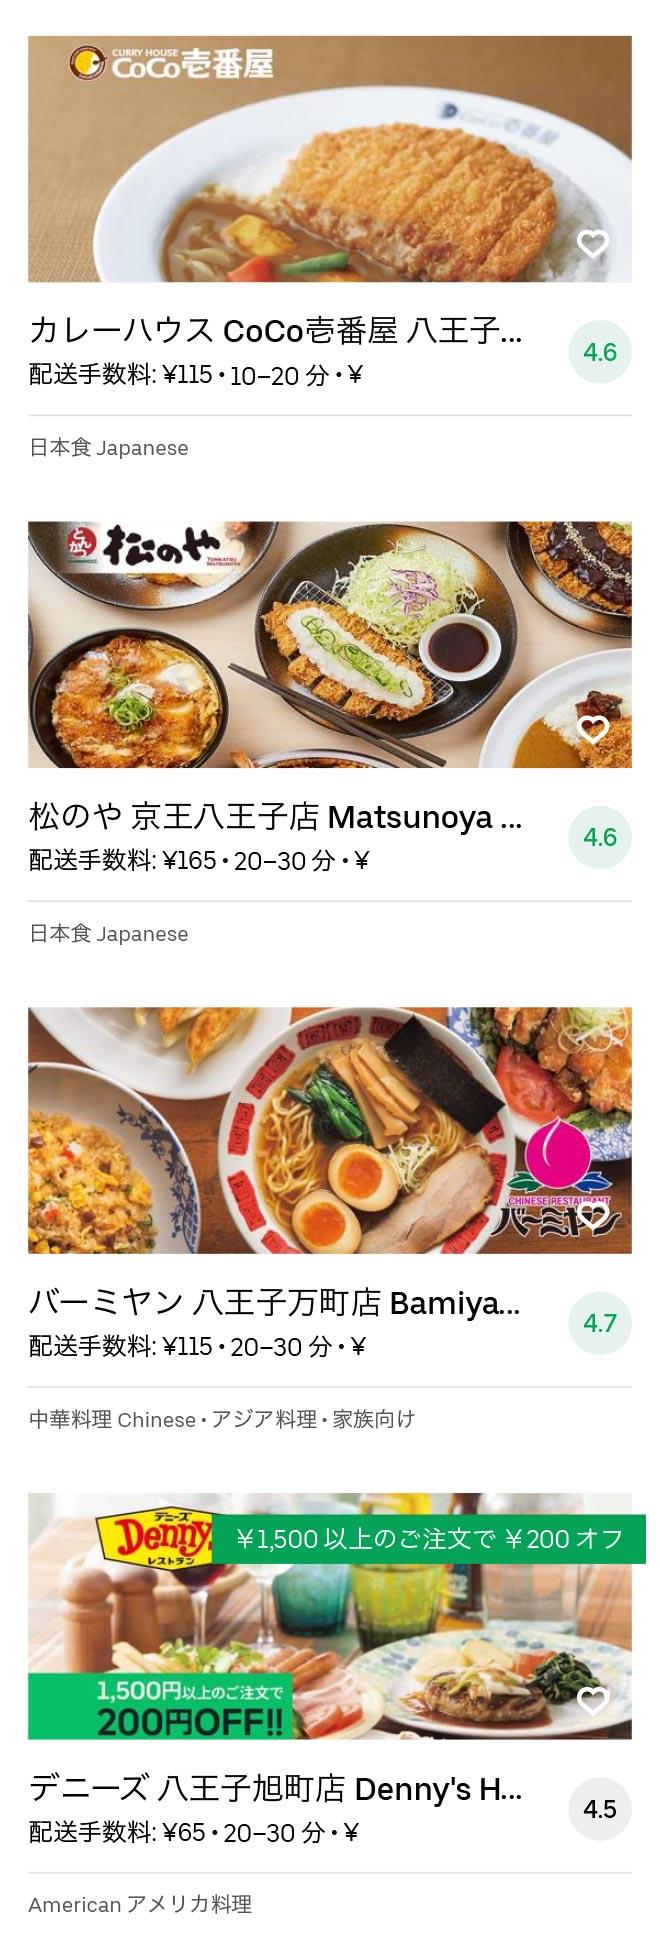 Hatioji menu 2010 08